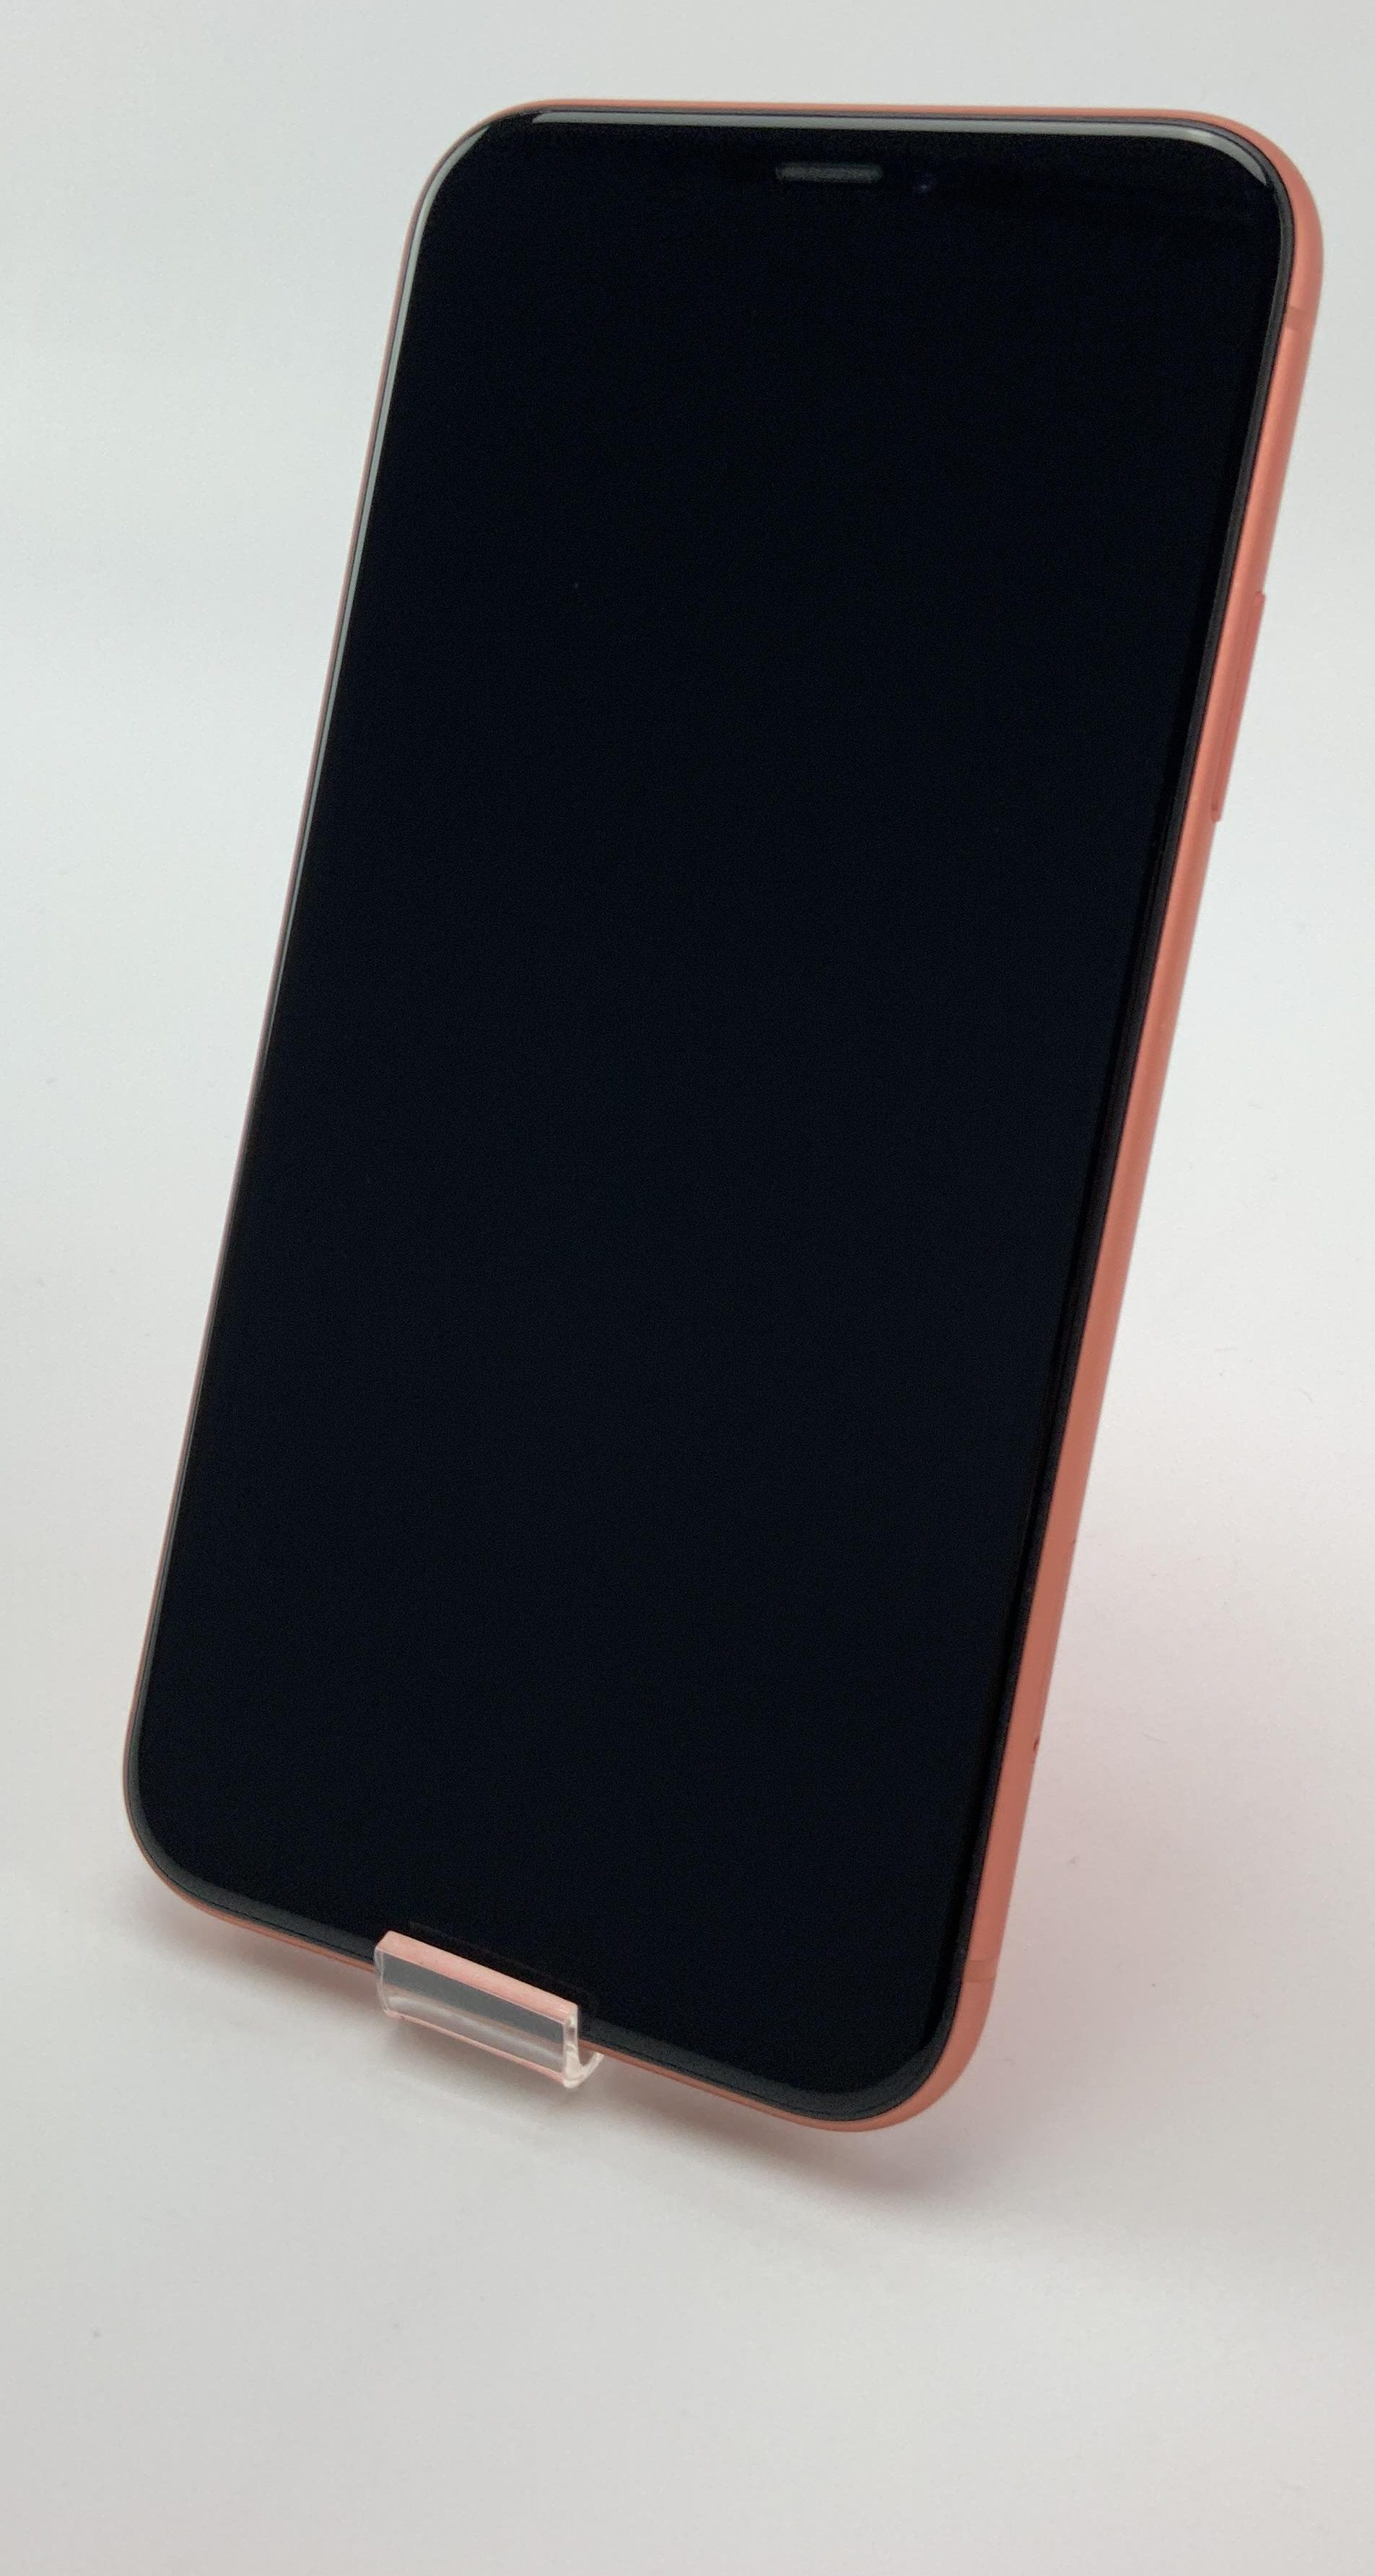 iPhone XR 64GB, 64GB, Coral, immagine 1